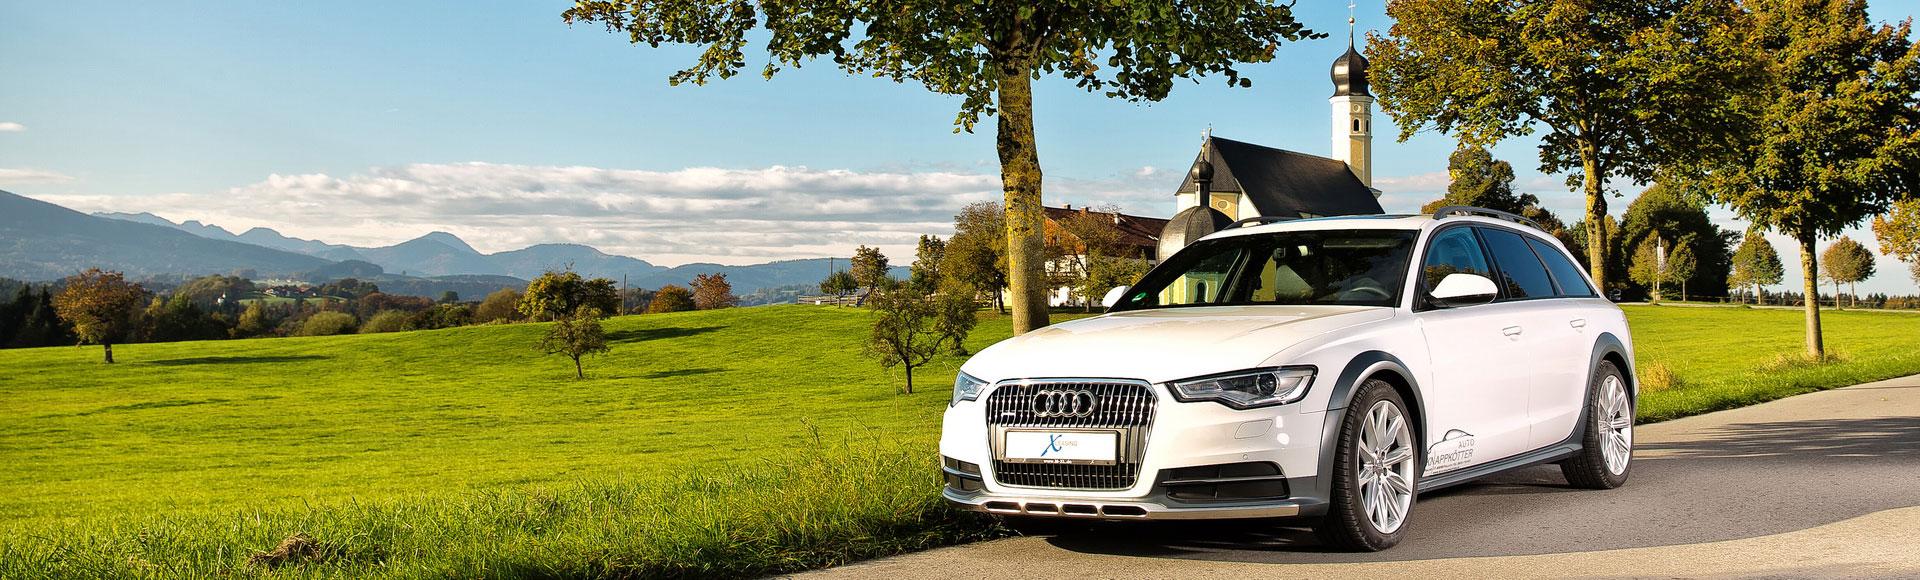 Audi A6 Allroad 2014 Herbst 3853